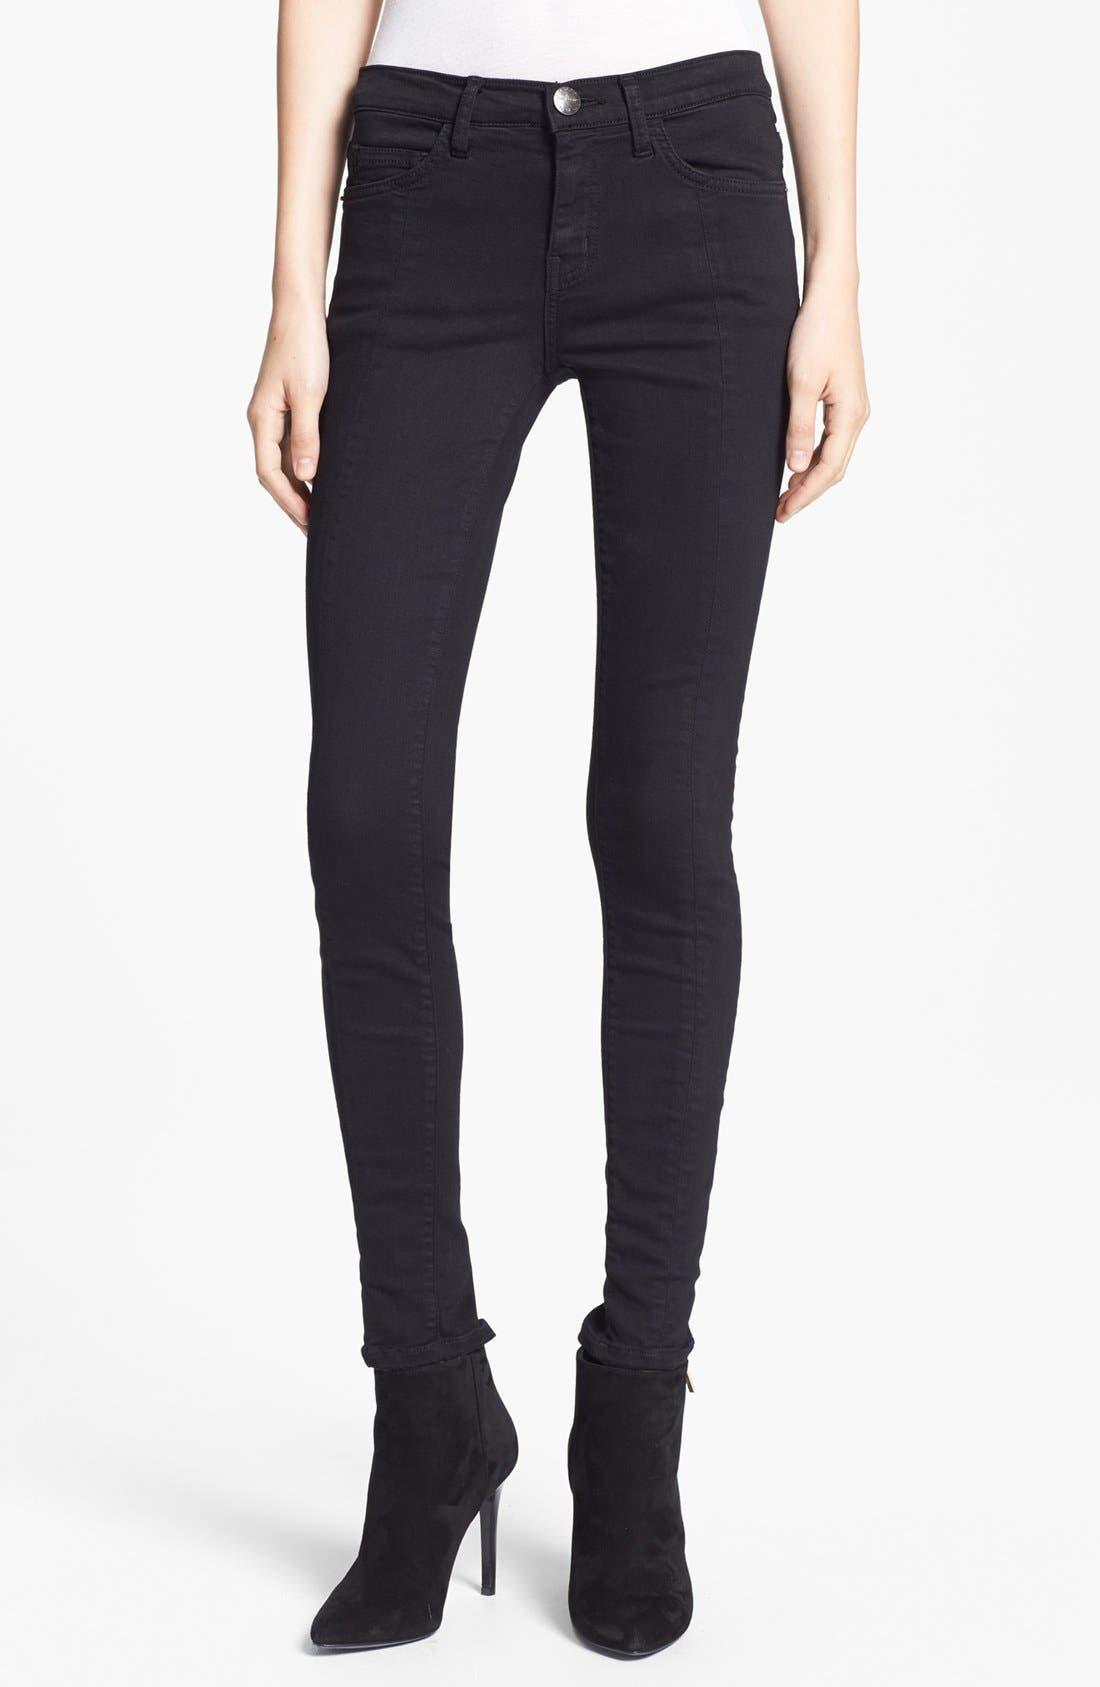 Alternate Image 1 Selected - Current/Elliott 'The Ankle Seamstress' Skinny Jeans (Jet Black)